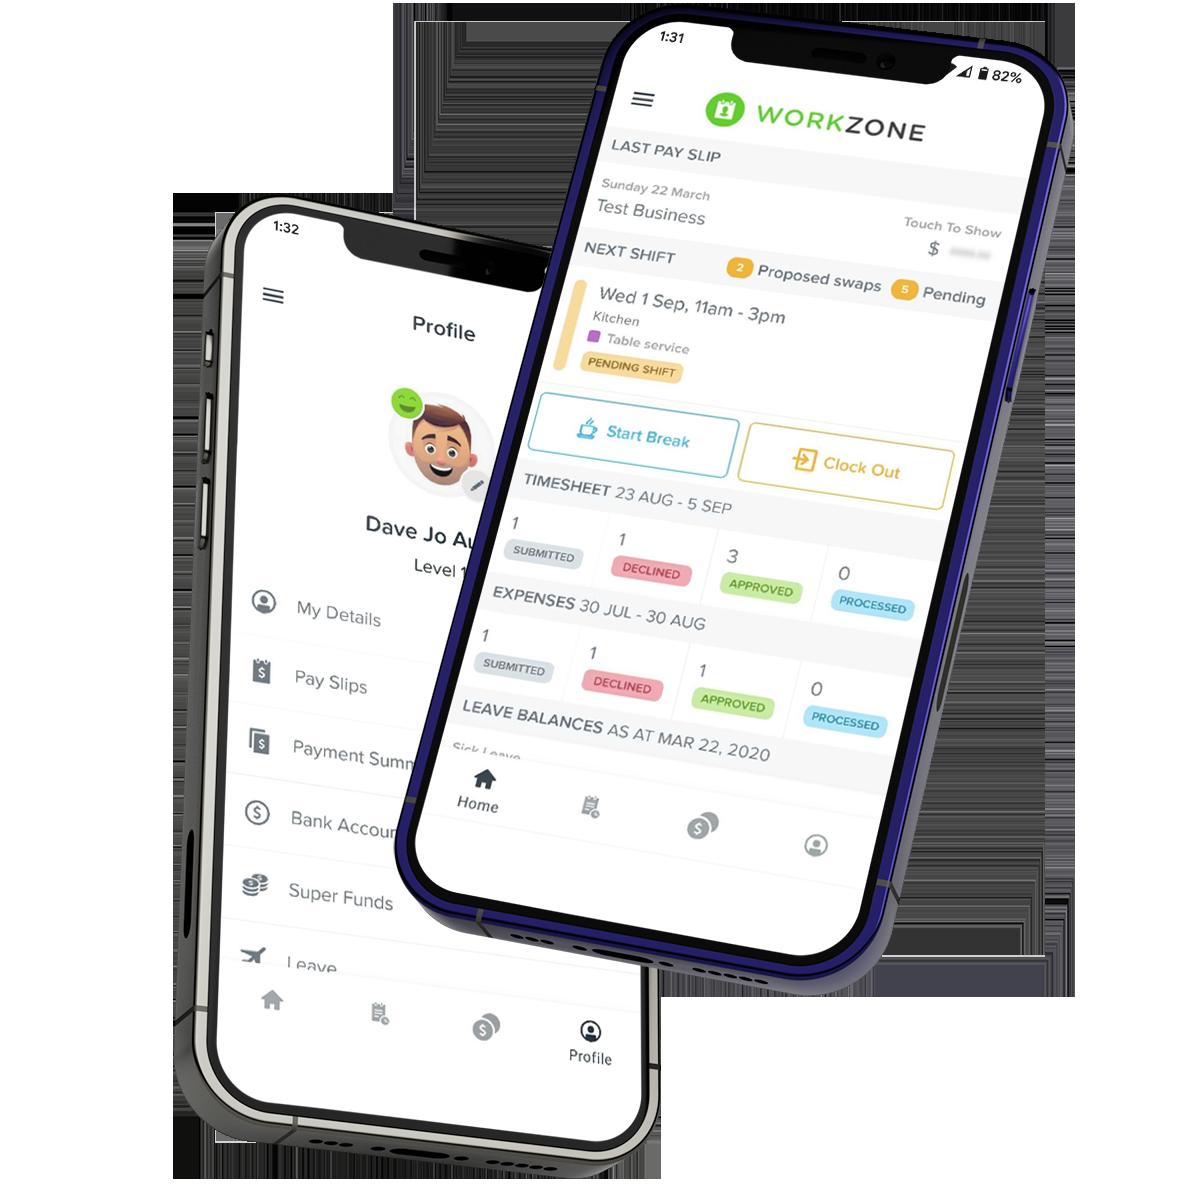 WorkZone screens on phone